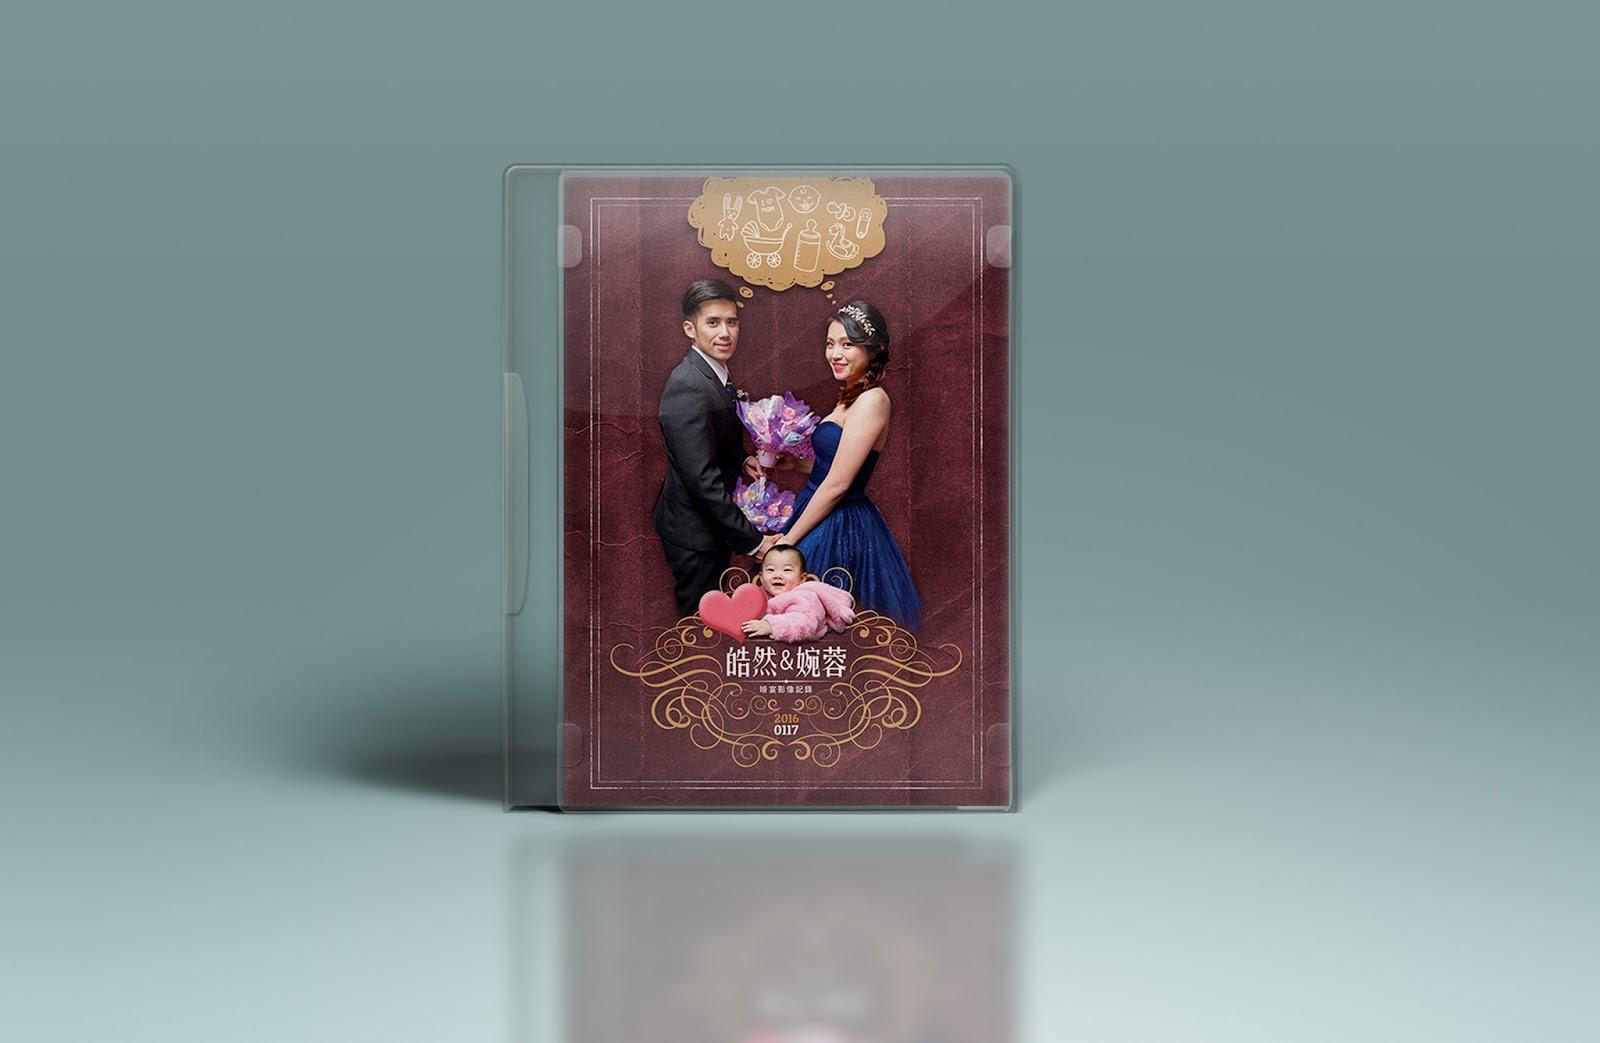 SHOWCASE作品展示 | 皓然×婉蓉婚攝DVD封面設計 by MUMULab.com